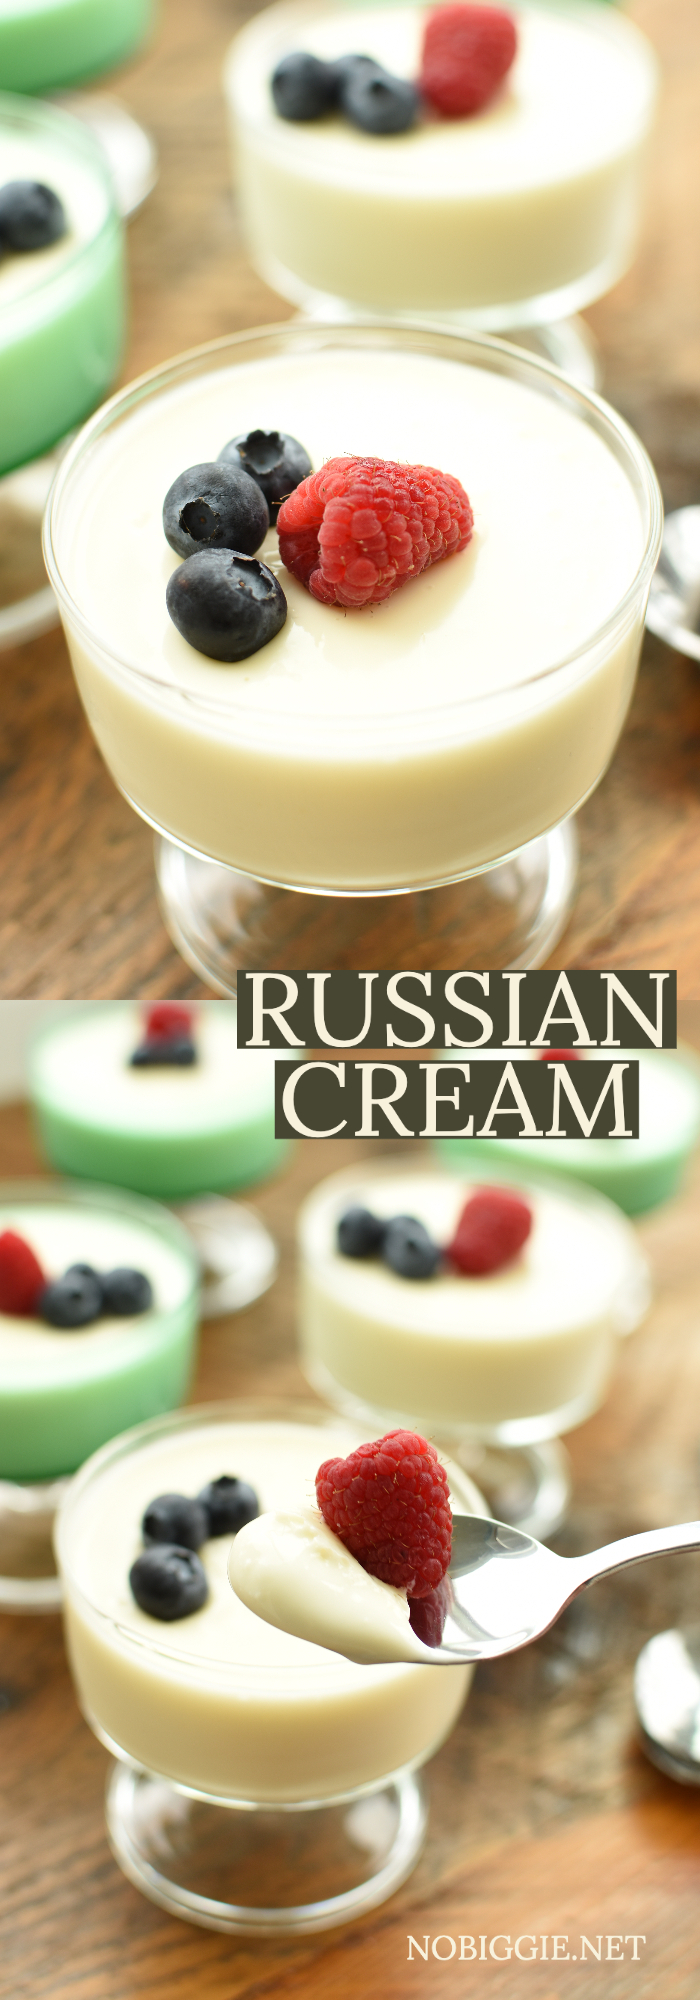 Russian cream dessert | NoBiggie.net